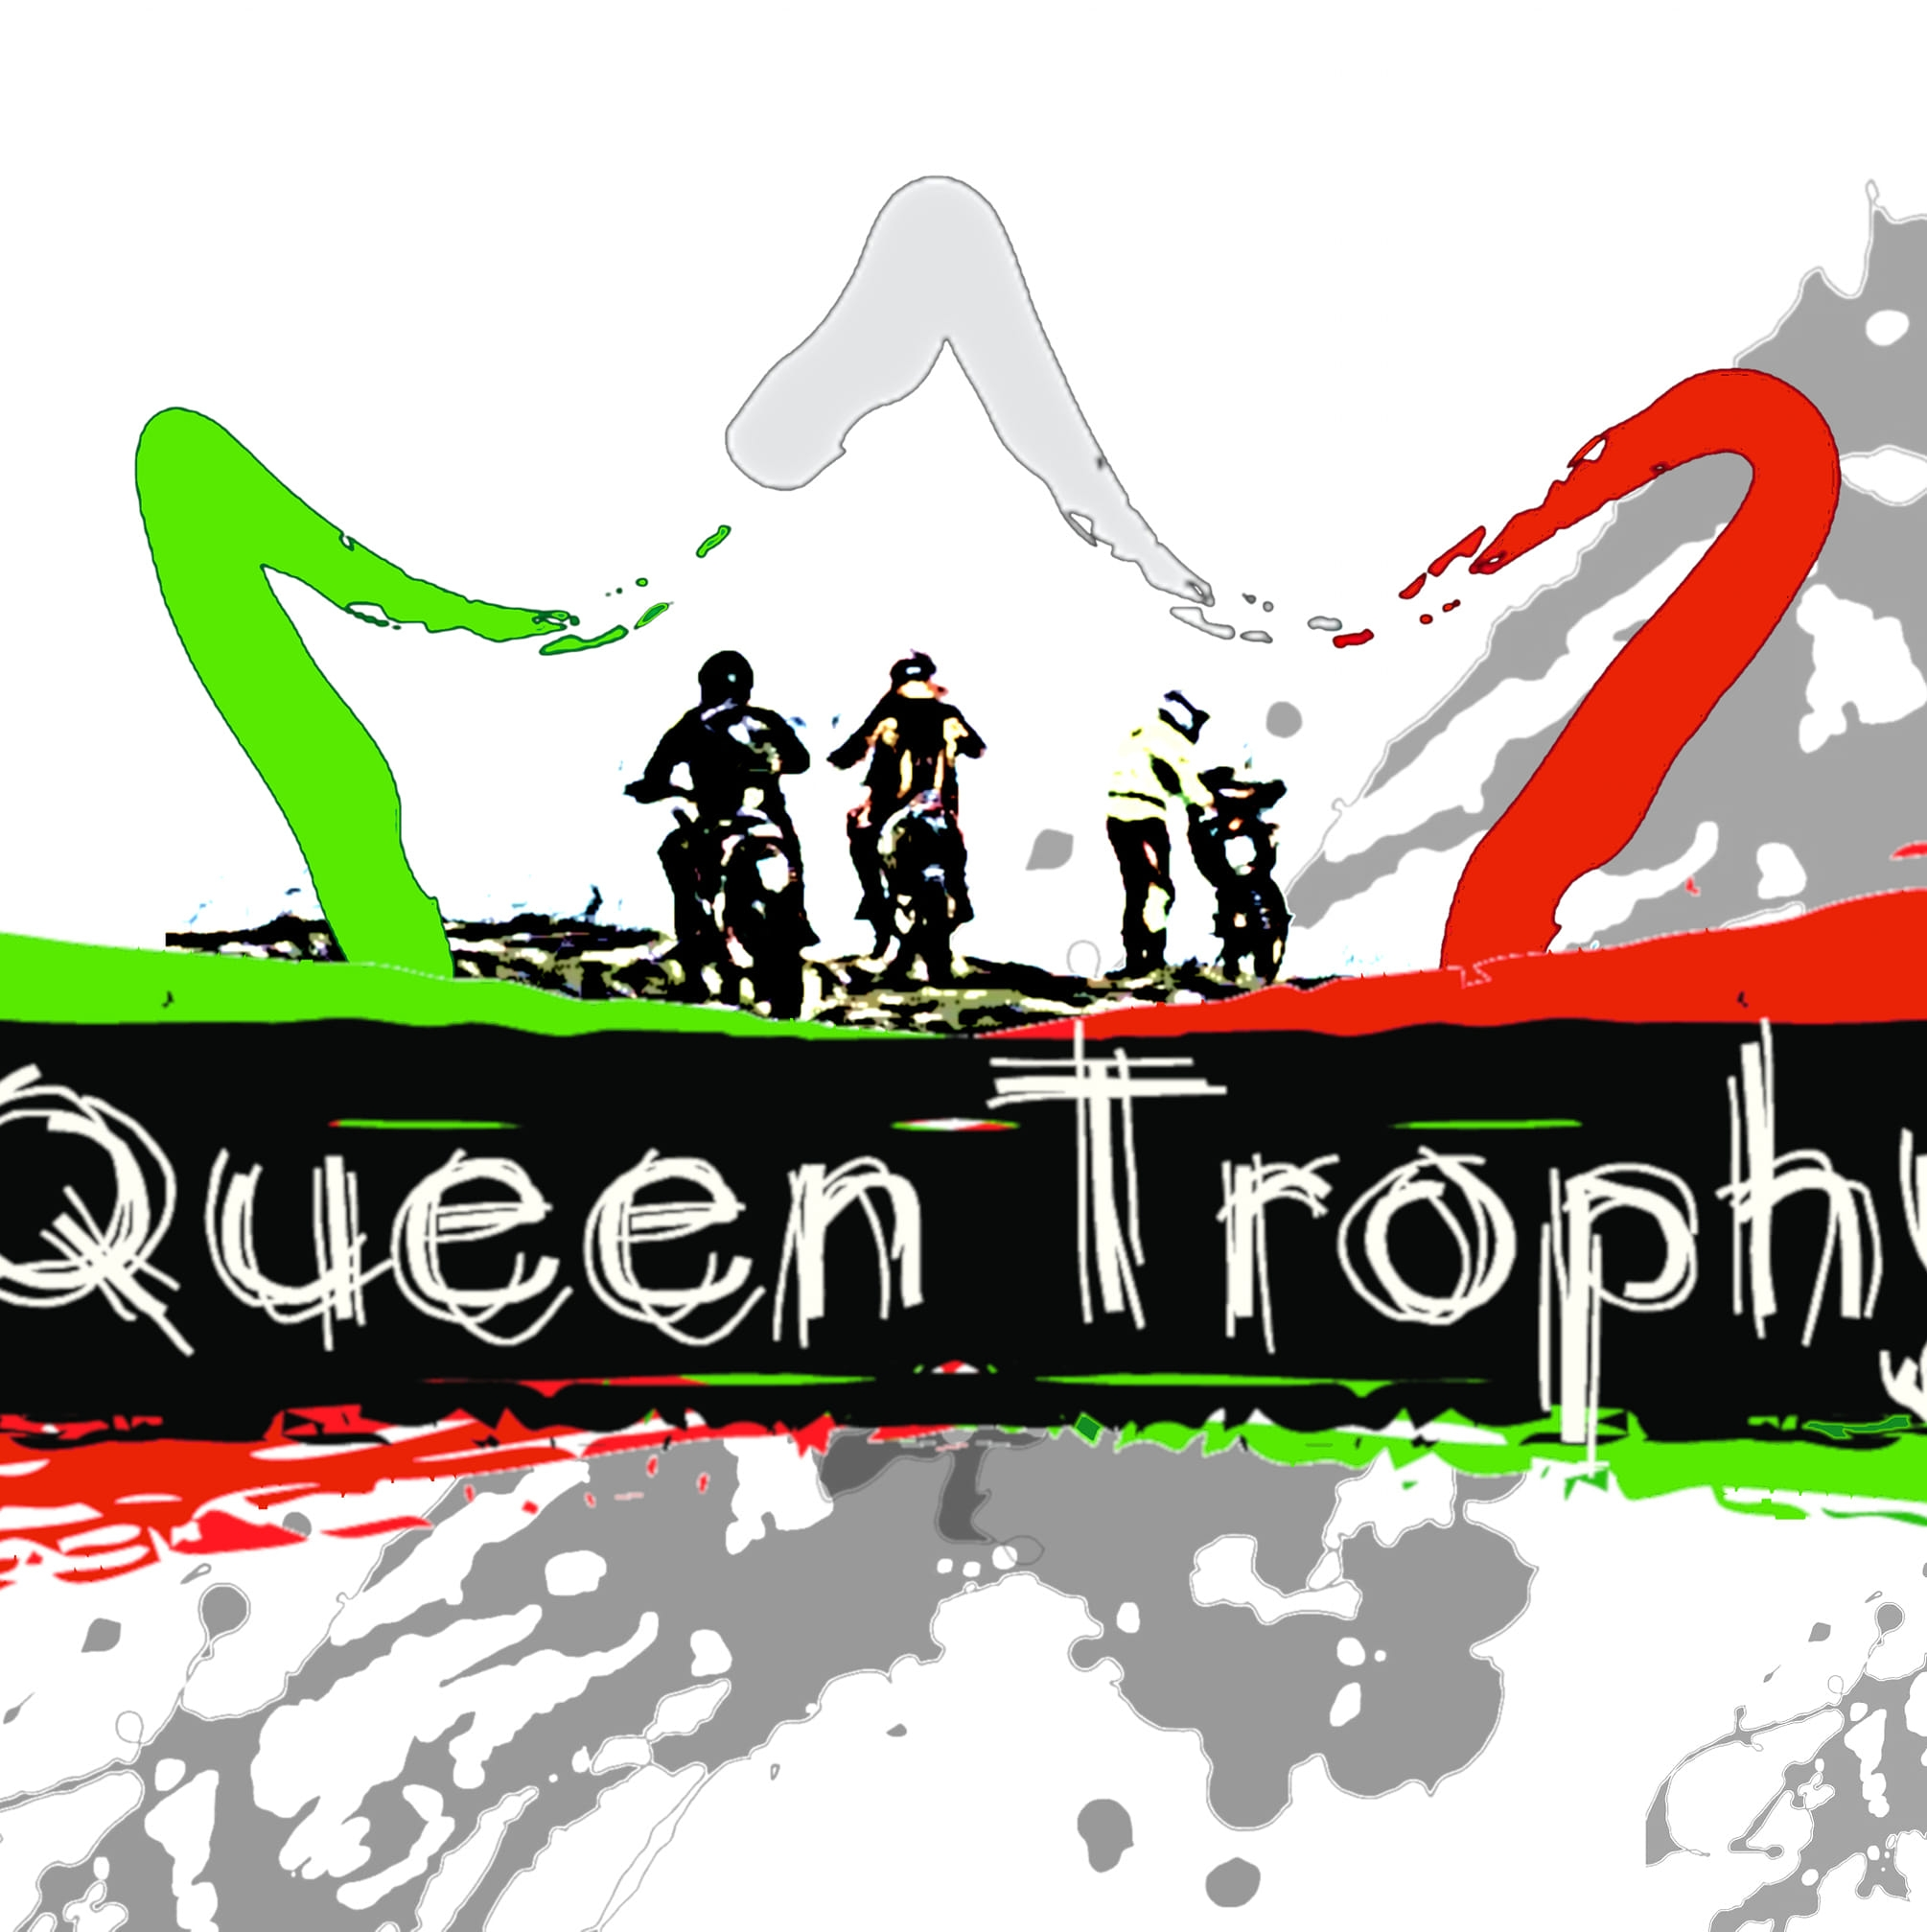 italiainpiega-evento-moto off road 2021-queen trophy